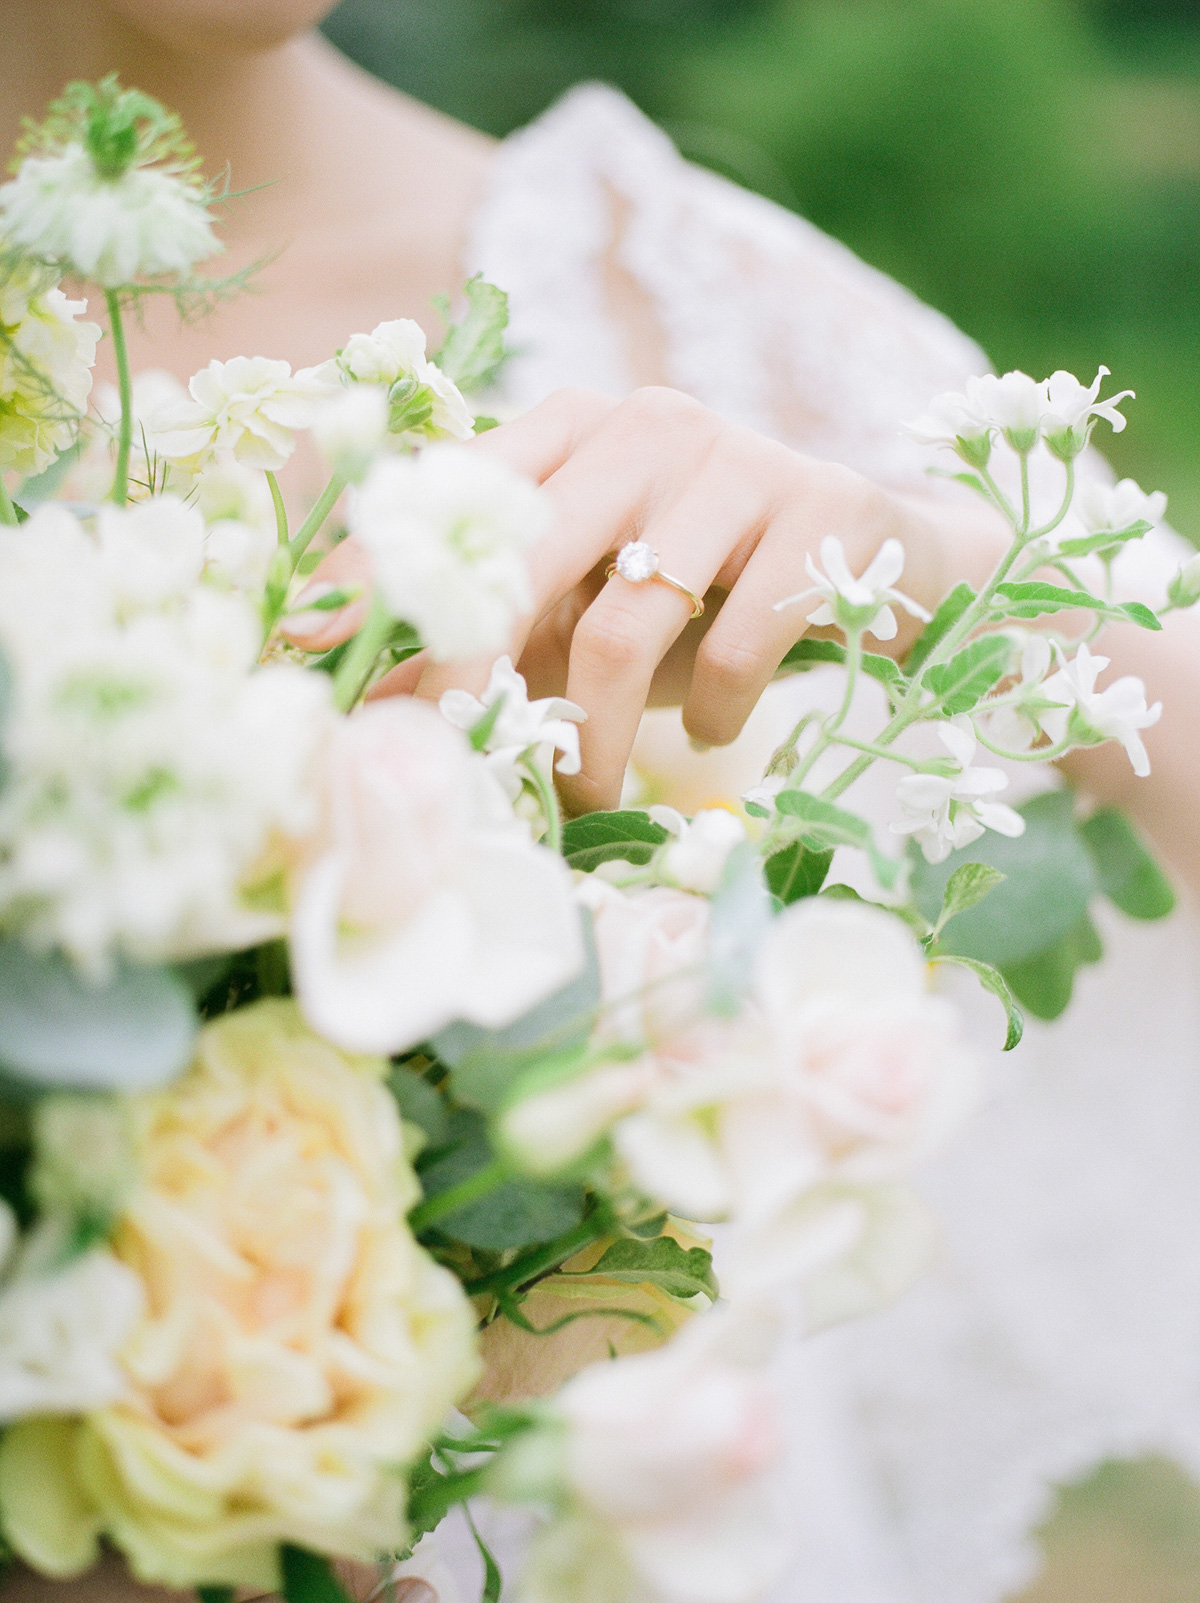 jennifer-xu-photography-vineyard-bride-swish-list-rosewod-eatstes-winery-beamsville-wedding-editorial-19.jpg